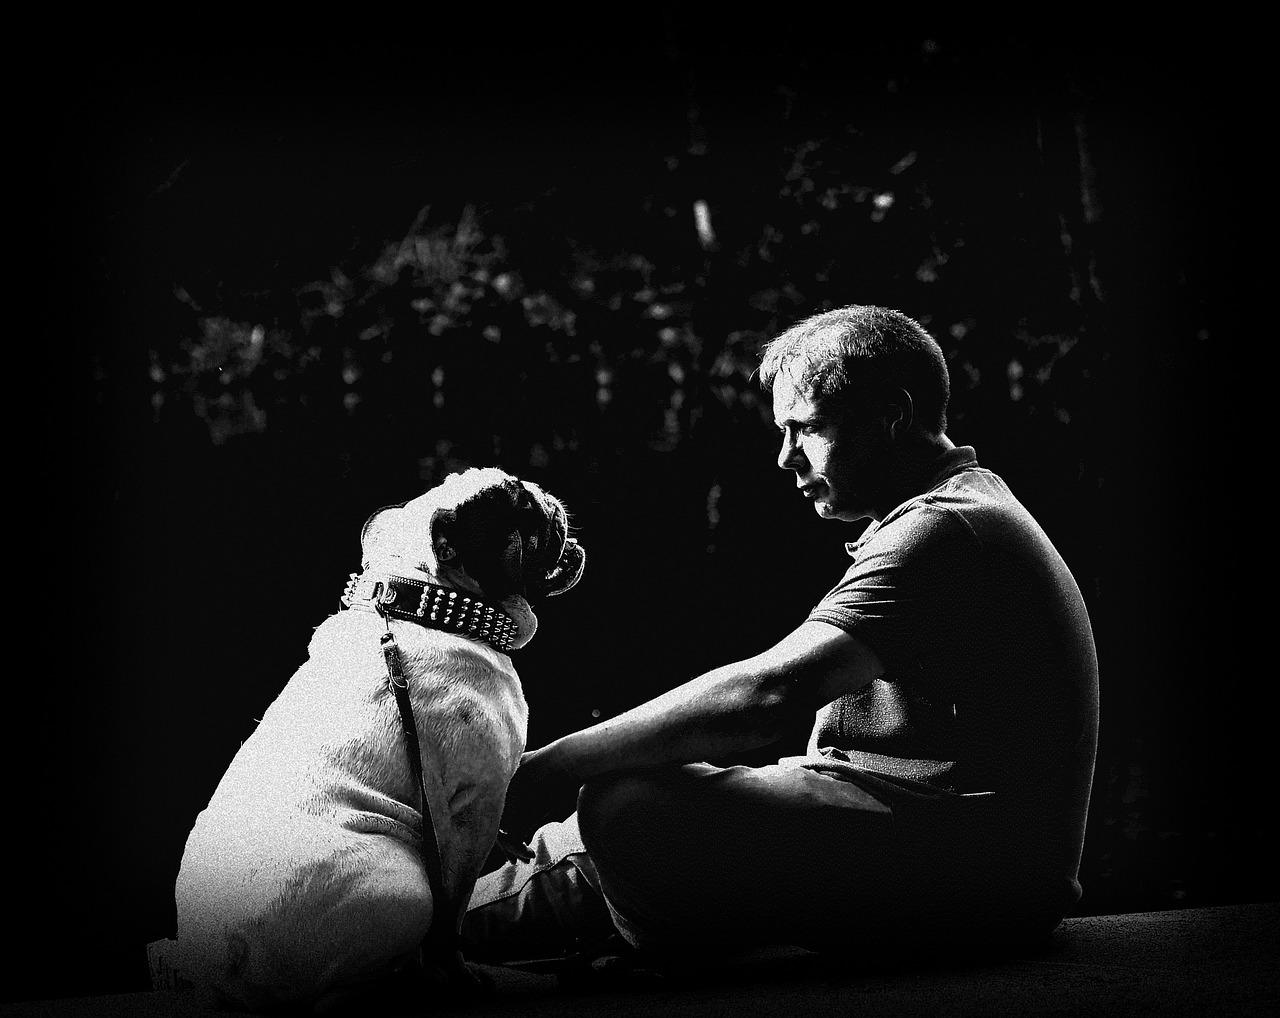 animal pet dog communication bulldog friendship Critter Caretakers Pet Services What Is Animal Communication?